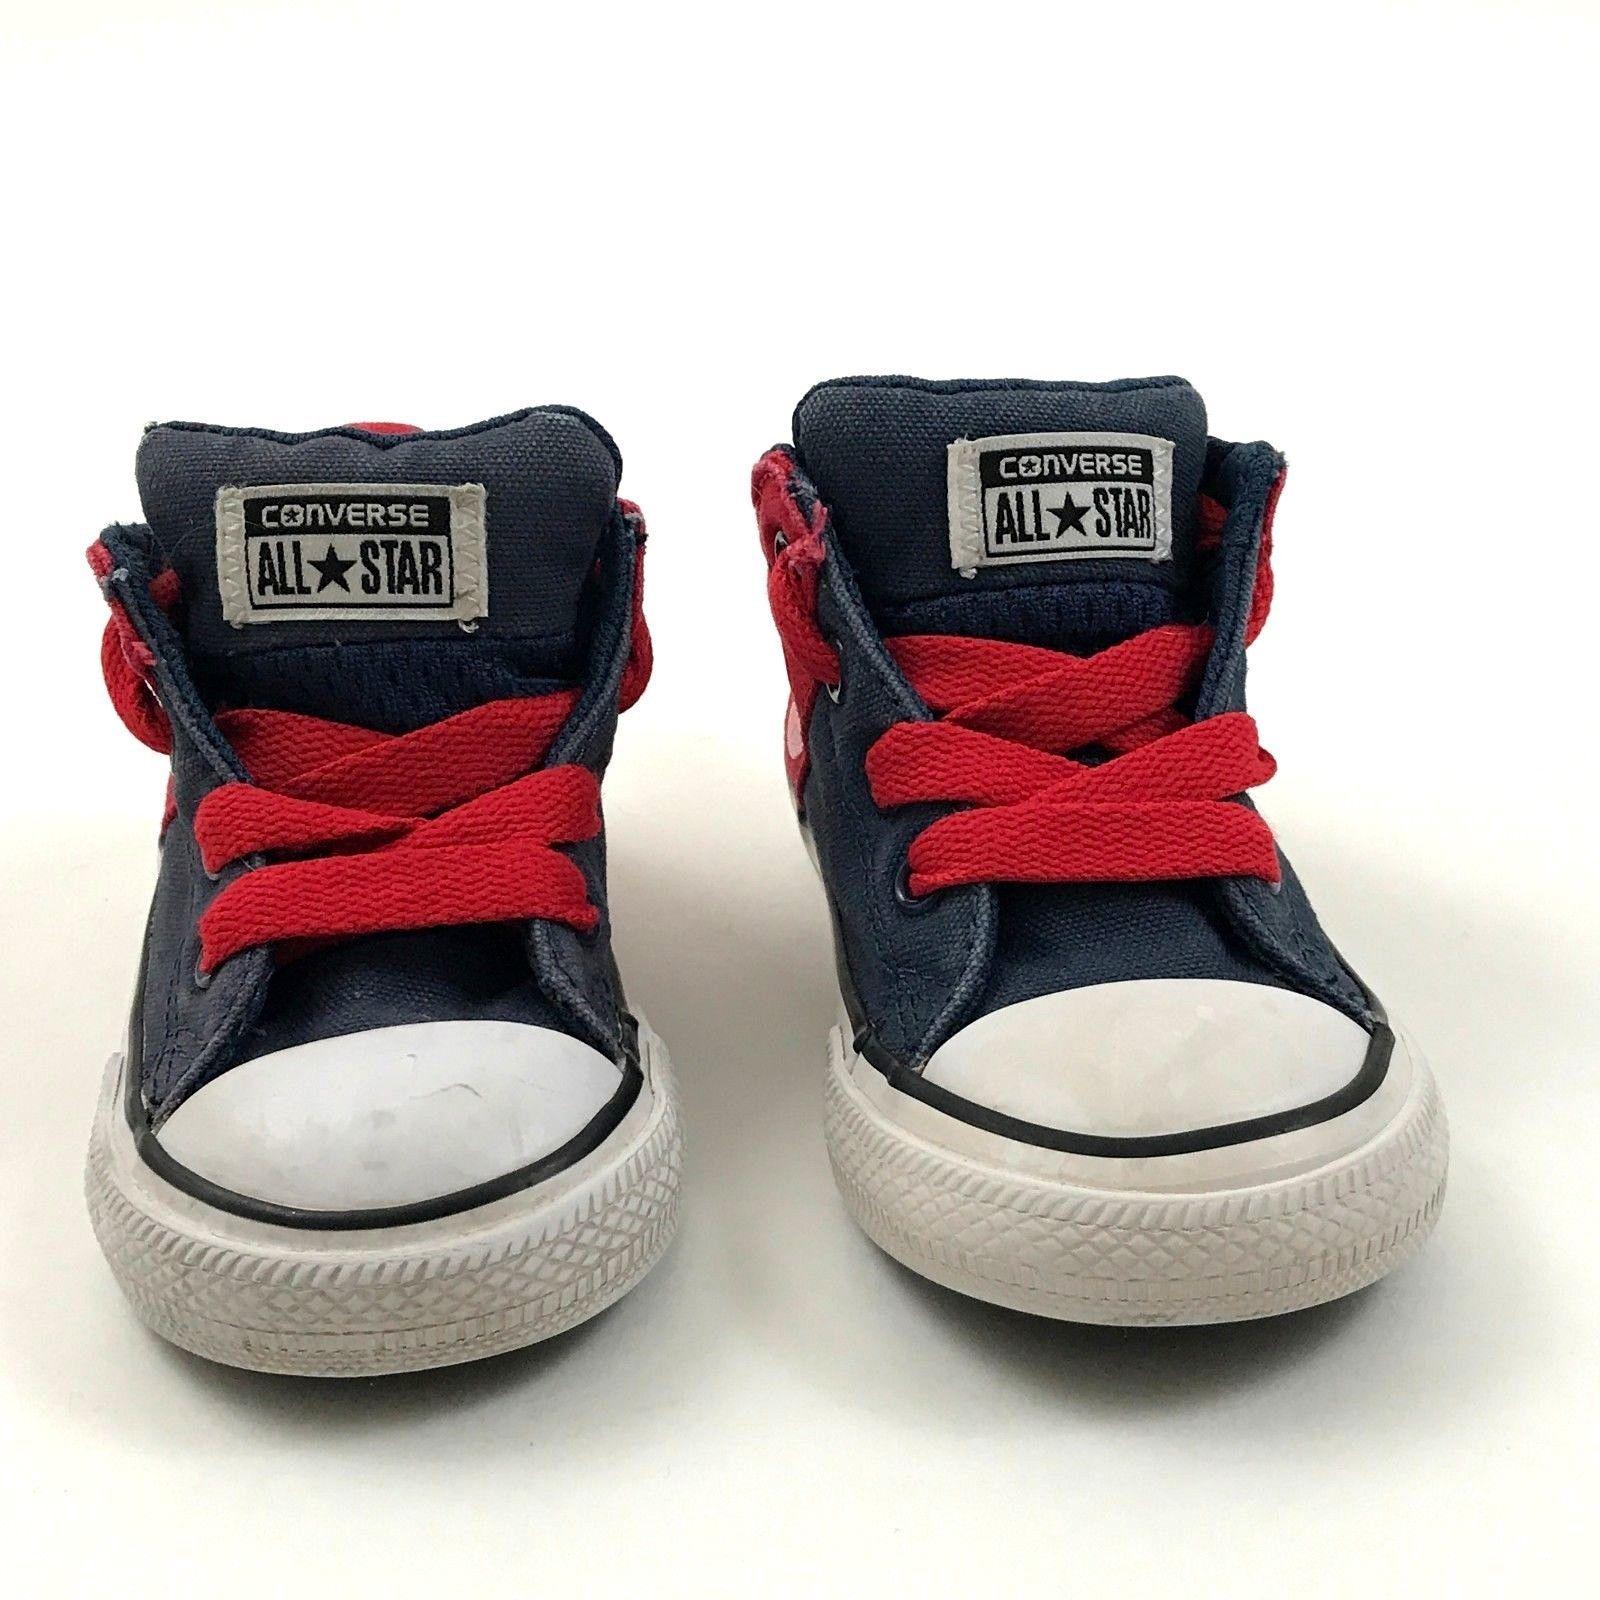 on sale 1a70c 45371 Kleinkinder Converse Chucks Größe 5 and 12 similar items